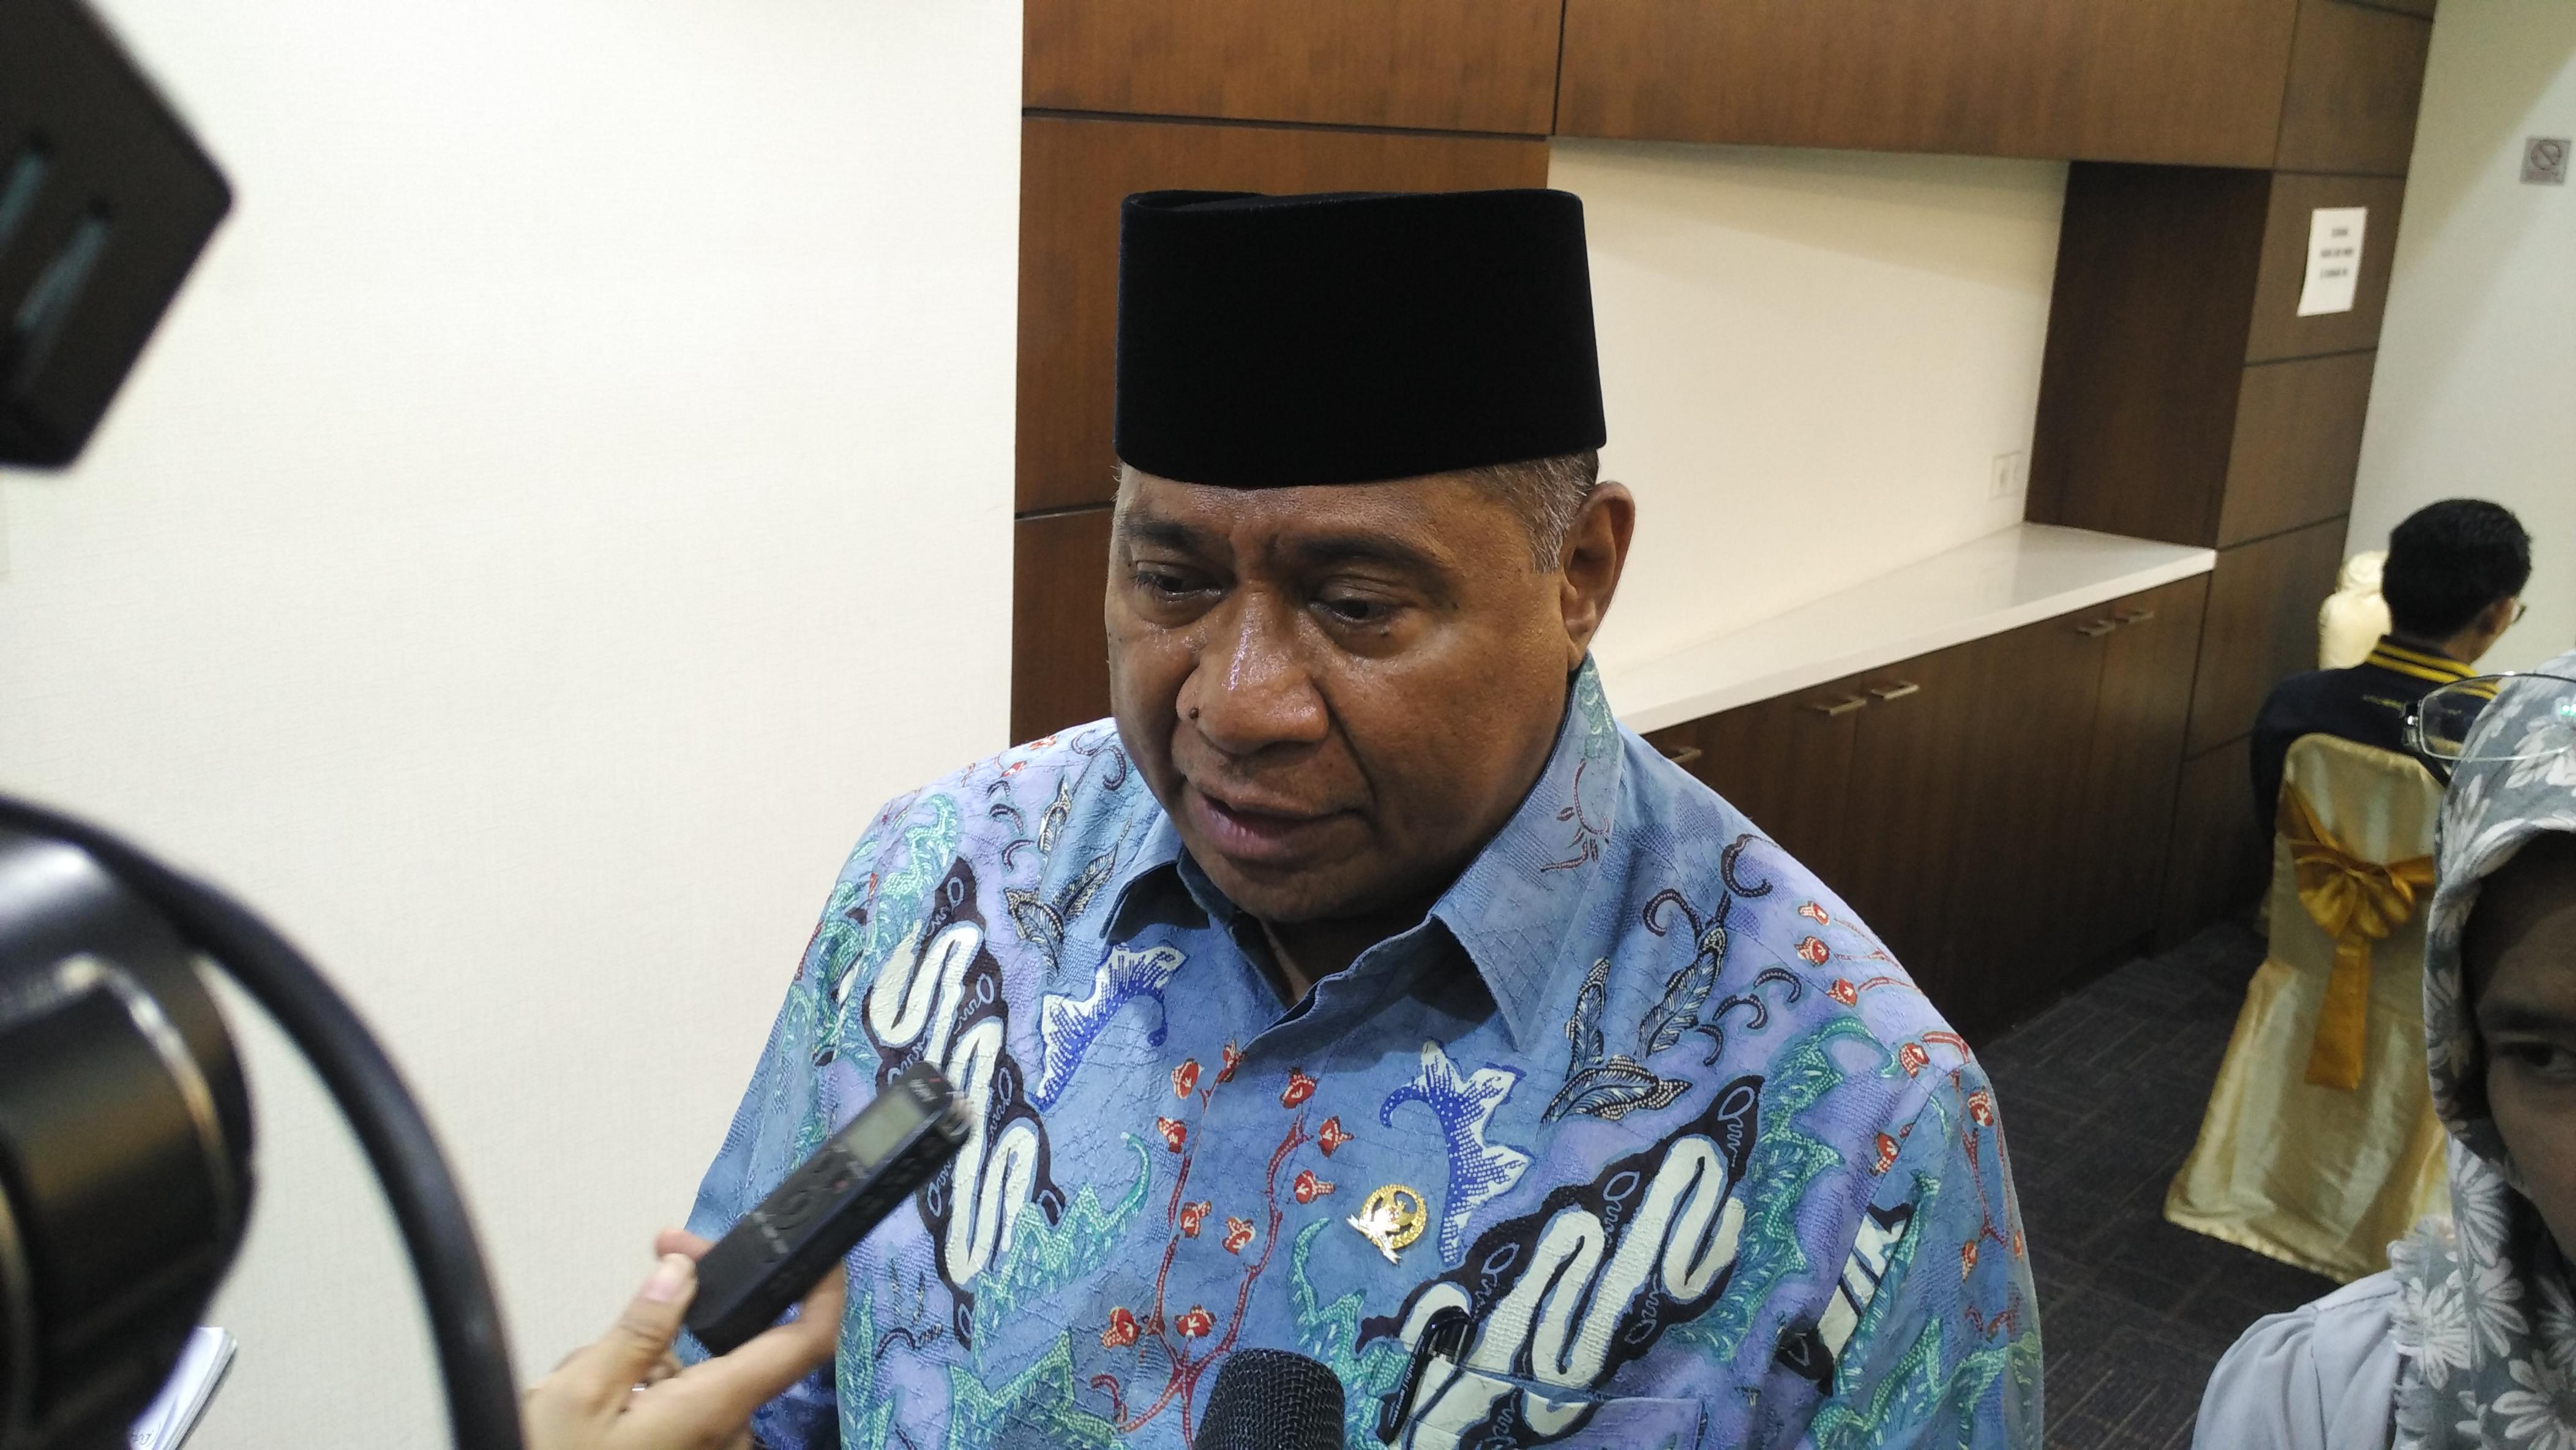 Komisi VIII Wanti-wanti Kemenag Jaga Kualitas Layanan Jamaah Haji